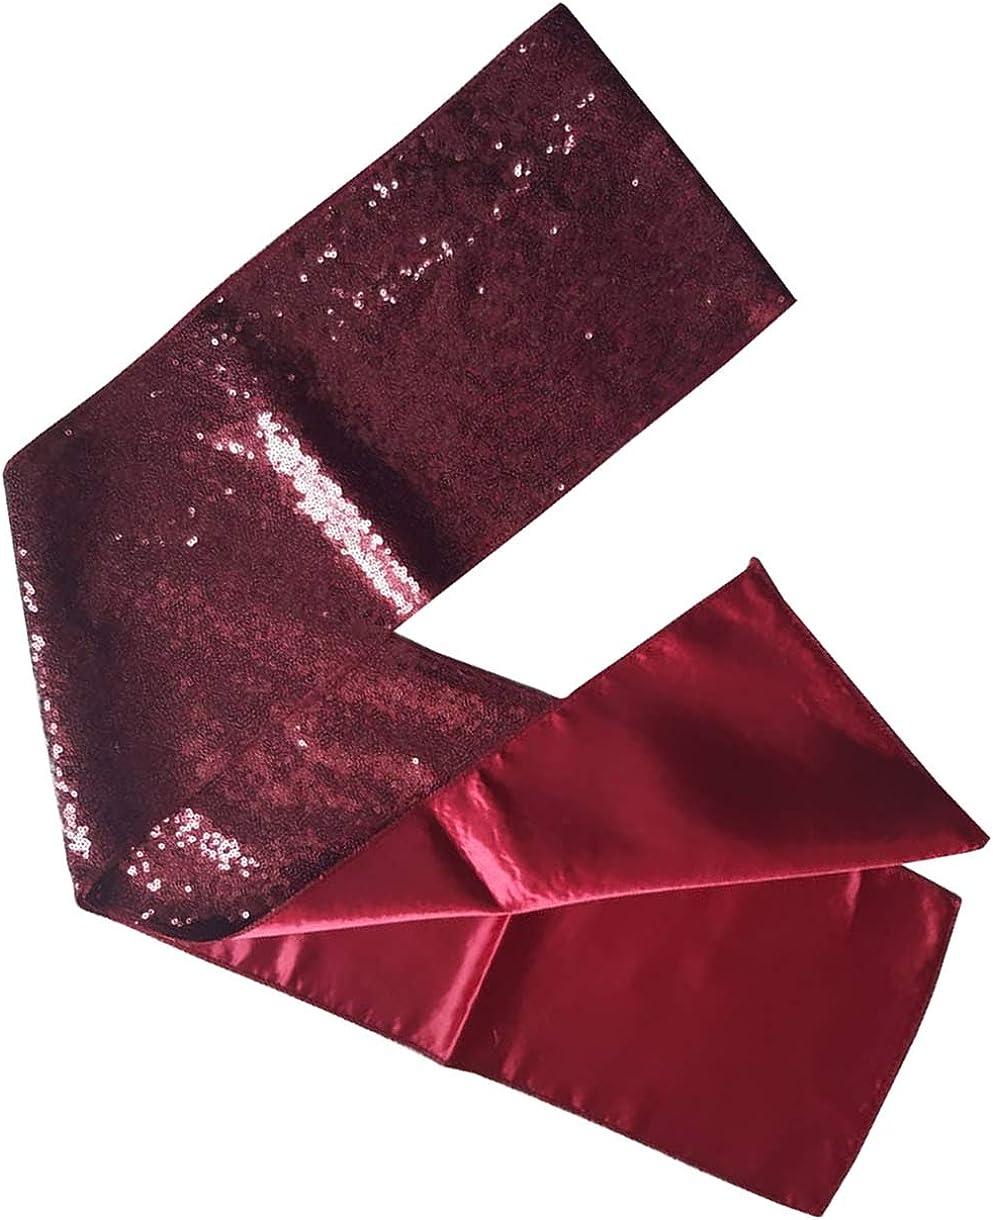 KVR Fashion Party Dance Vintage Sparkle Long girl teen Sequin polyester net scarf headband cum waist belt